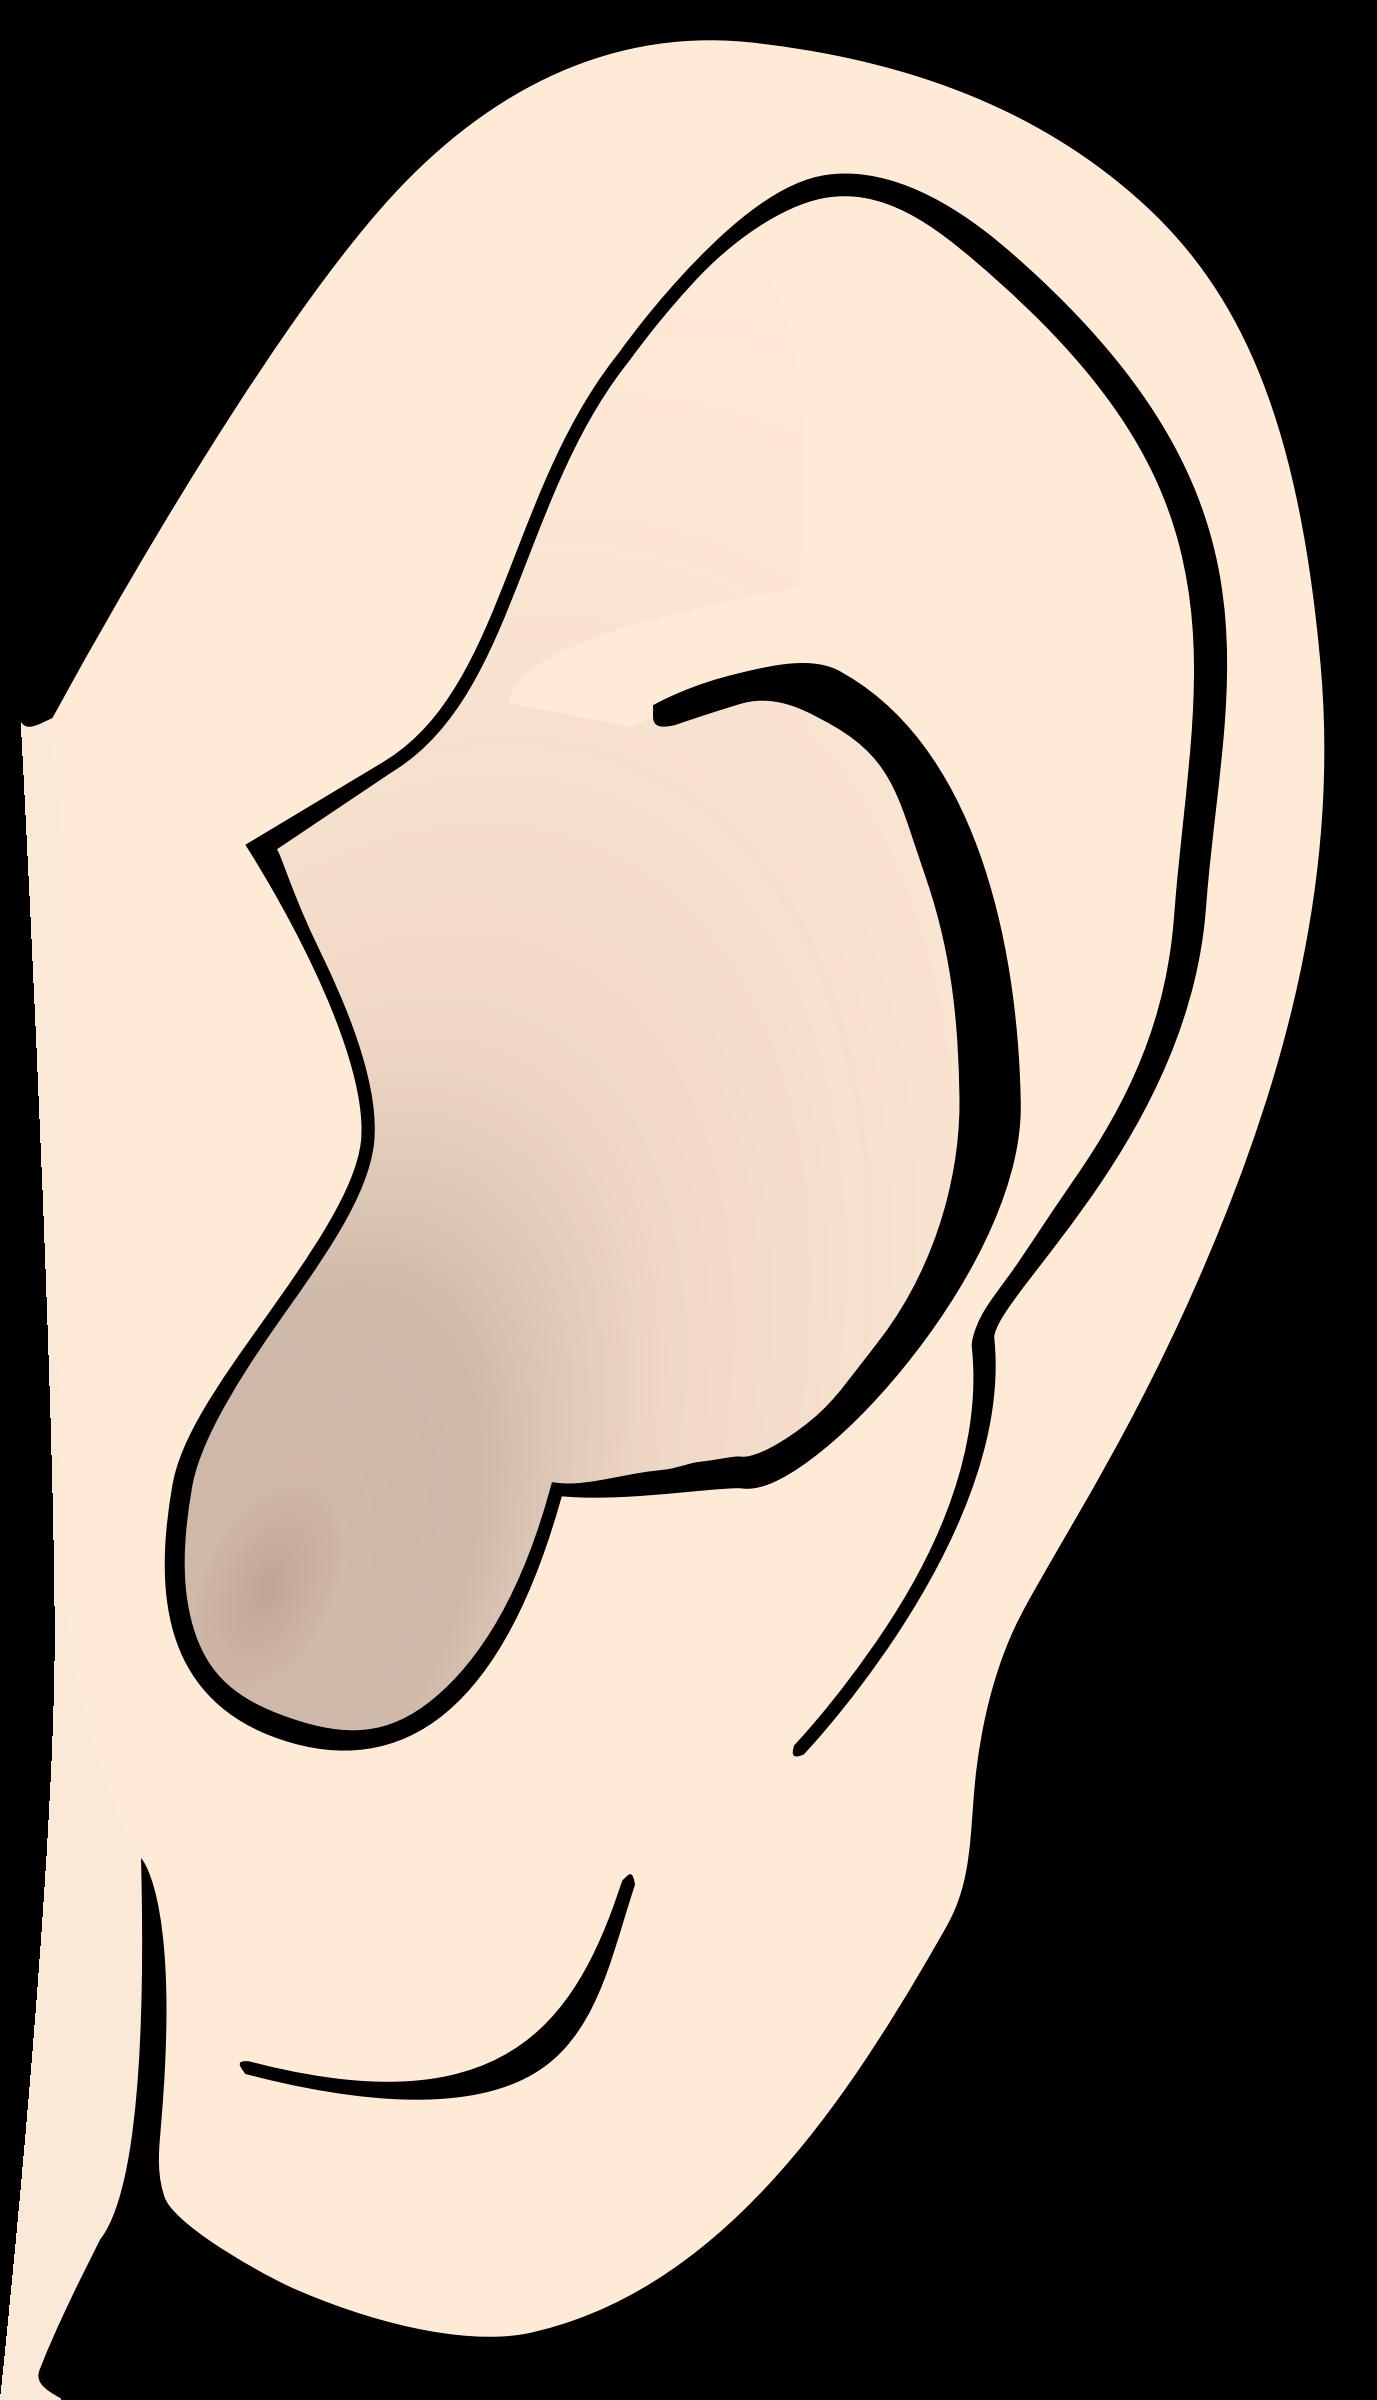 Left Big Ears Clipart